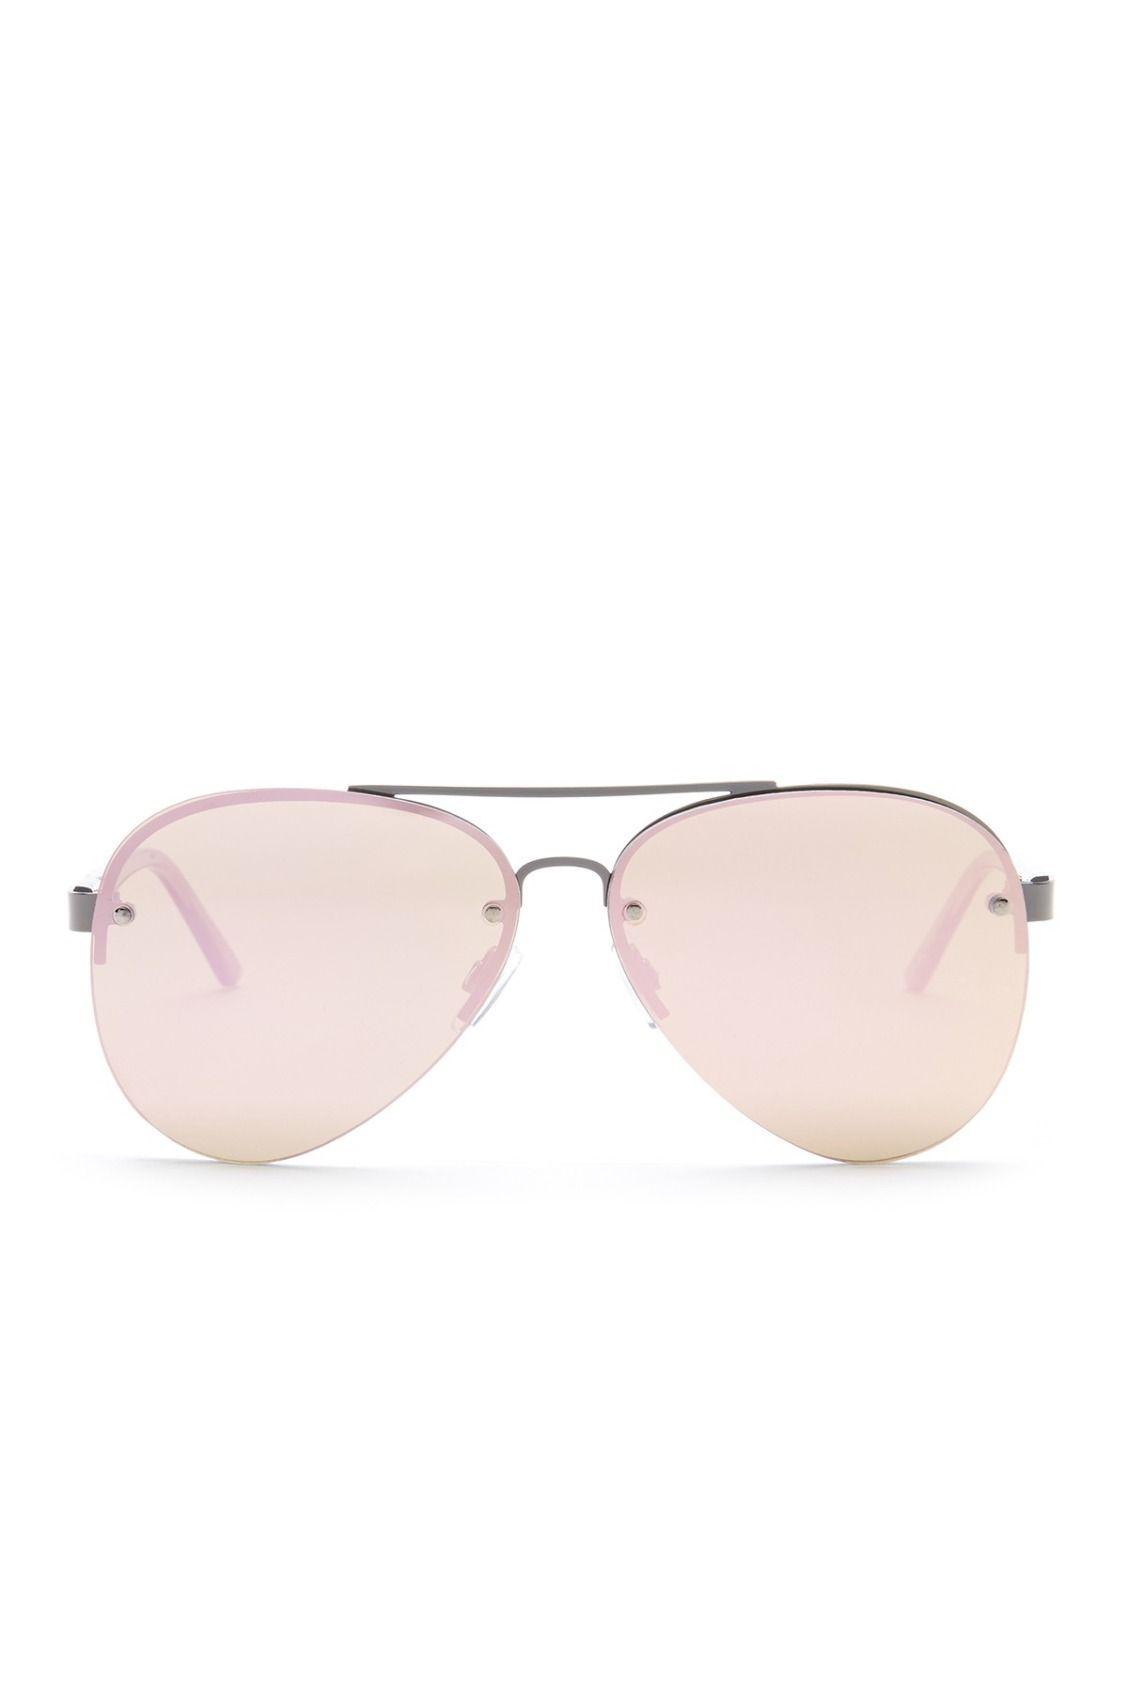 d469be5d12e19 Lucky Brand Gunmetal Women s Aviator Sunglasses